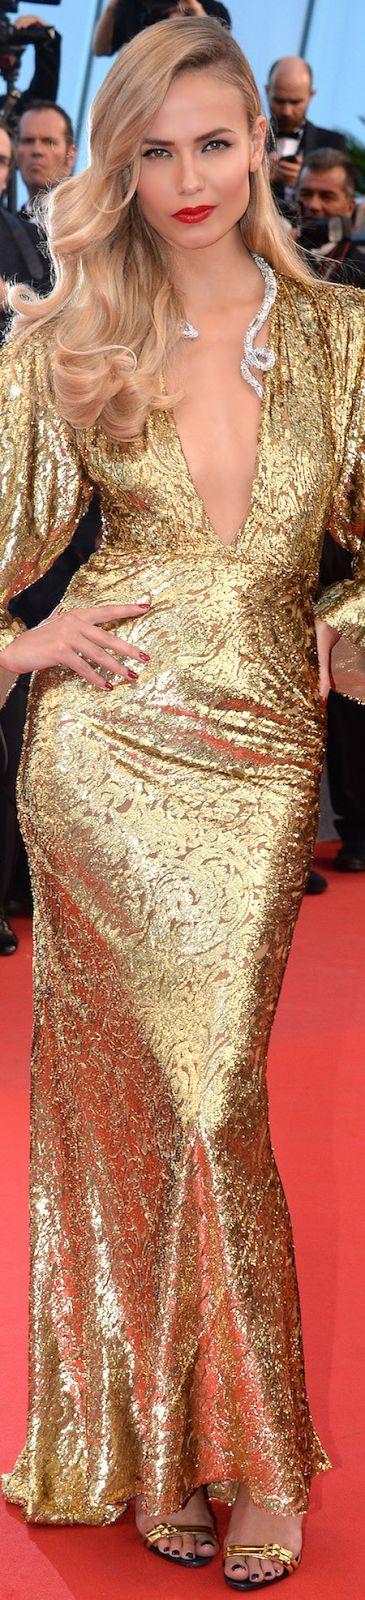 Natasha Poly 2015 Cannes Film Festival